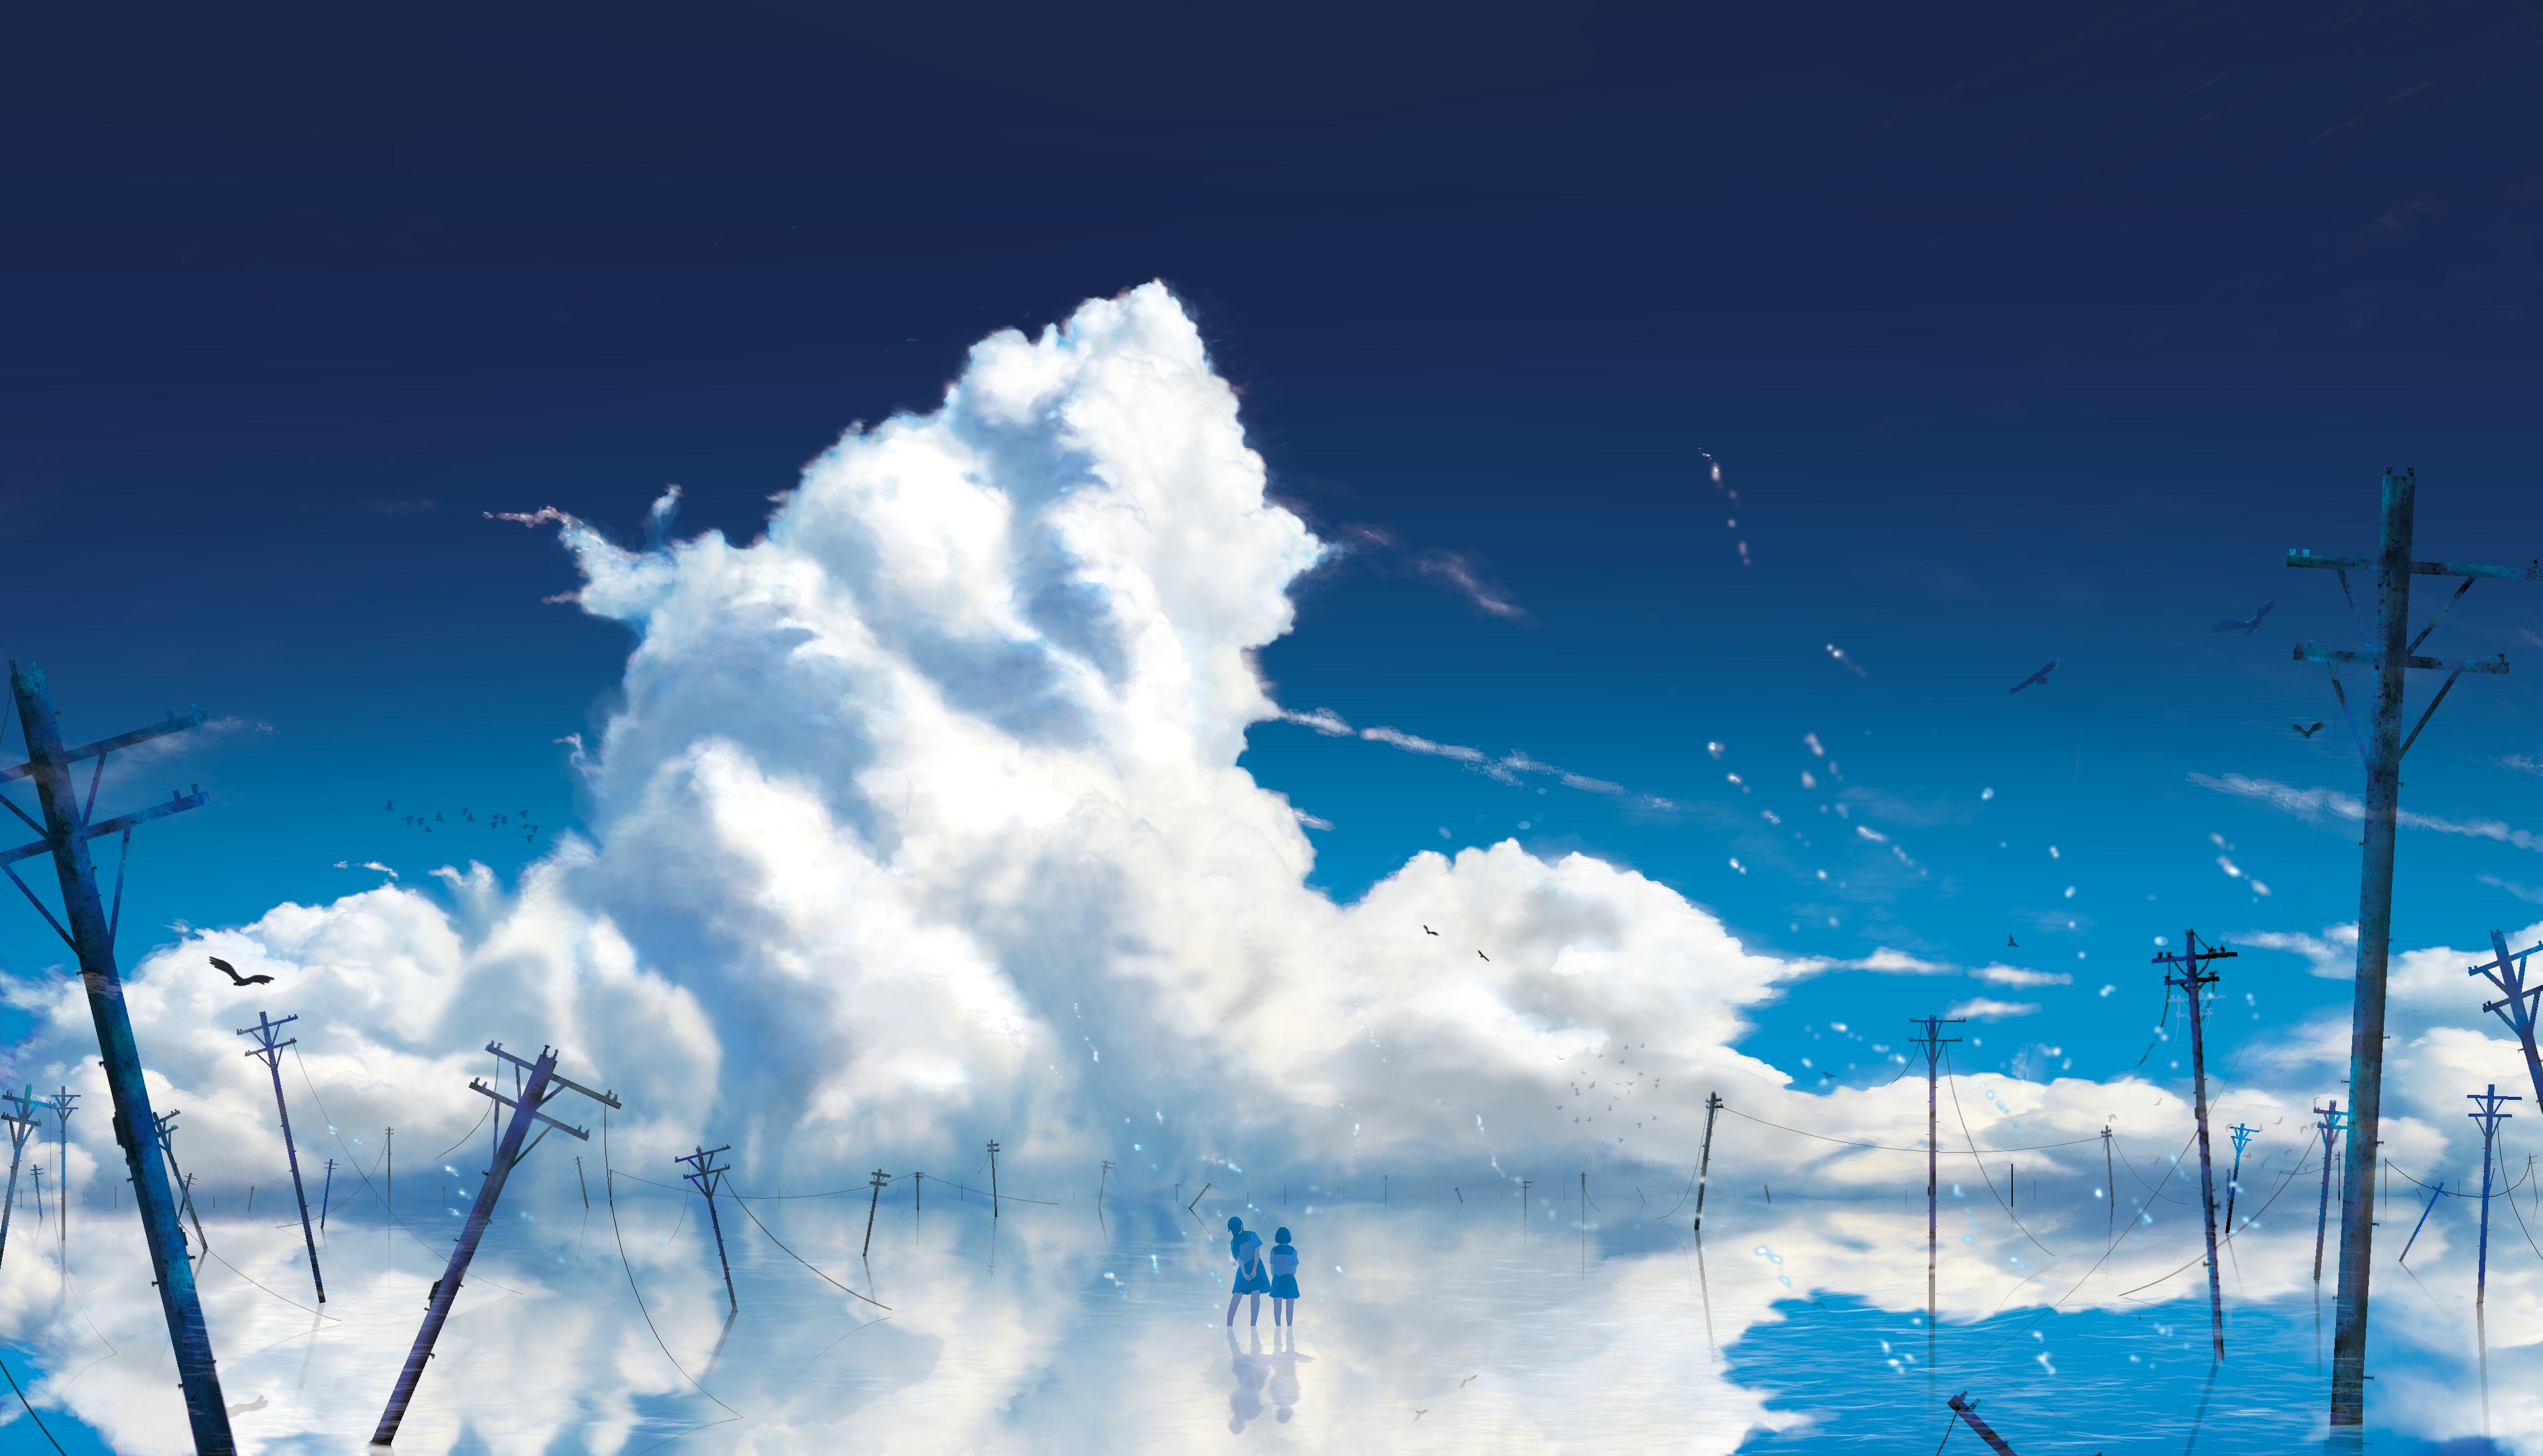 Bright Door Iphone X Hd 4k Wallpaper: Bright Skies 4k Ultra HD Wallpaper